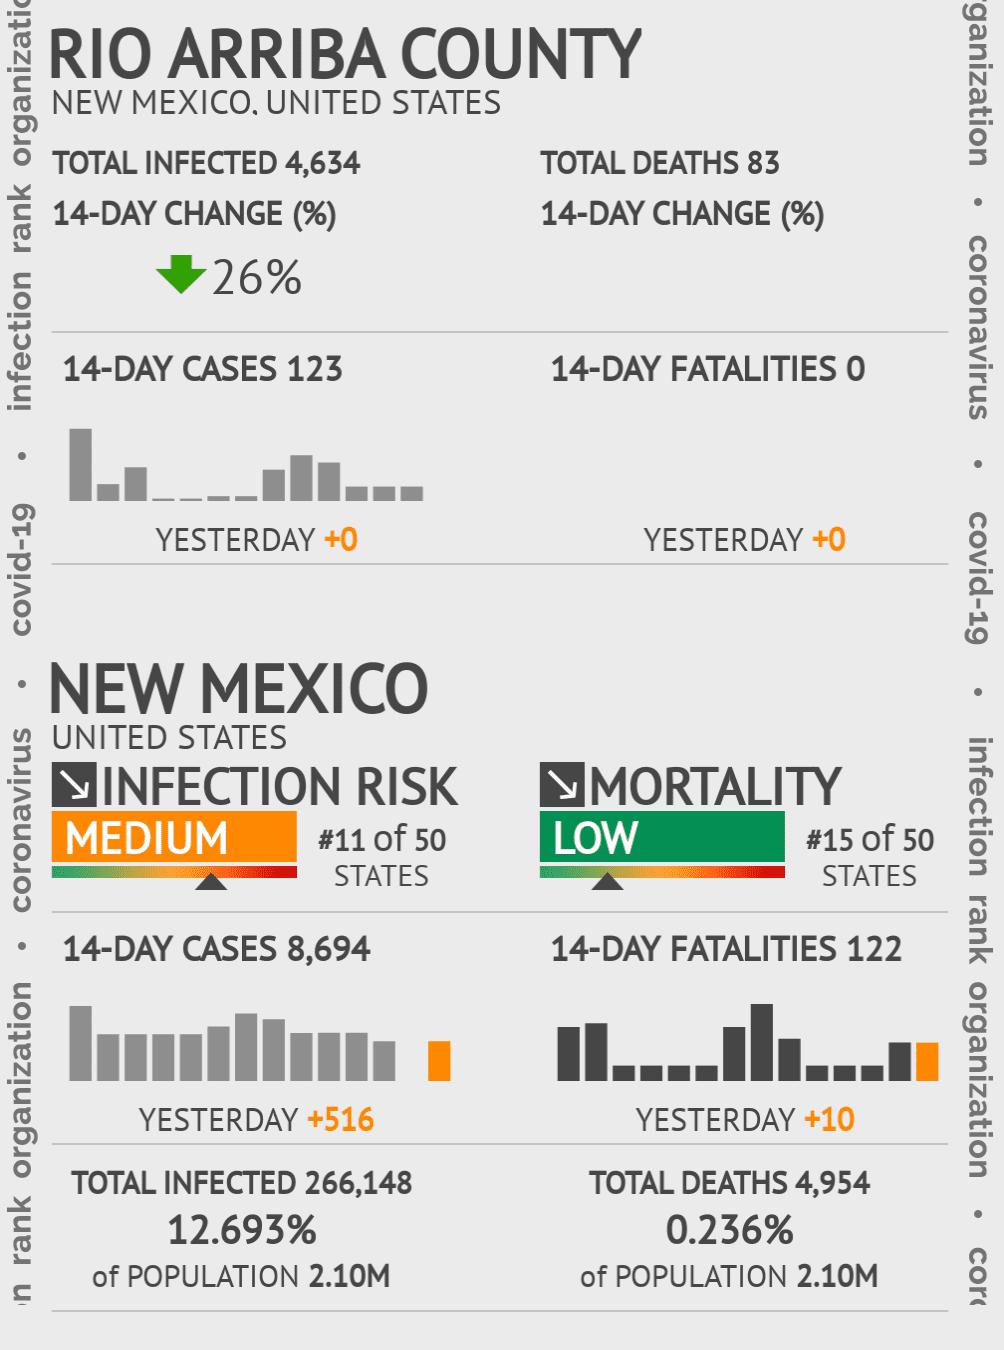 Rio Arriba County Coronavirus Covid-19 Risk of Infection on July 24, 2021